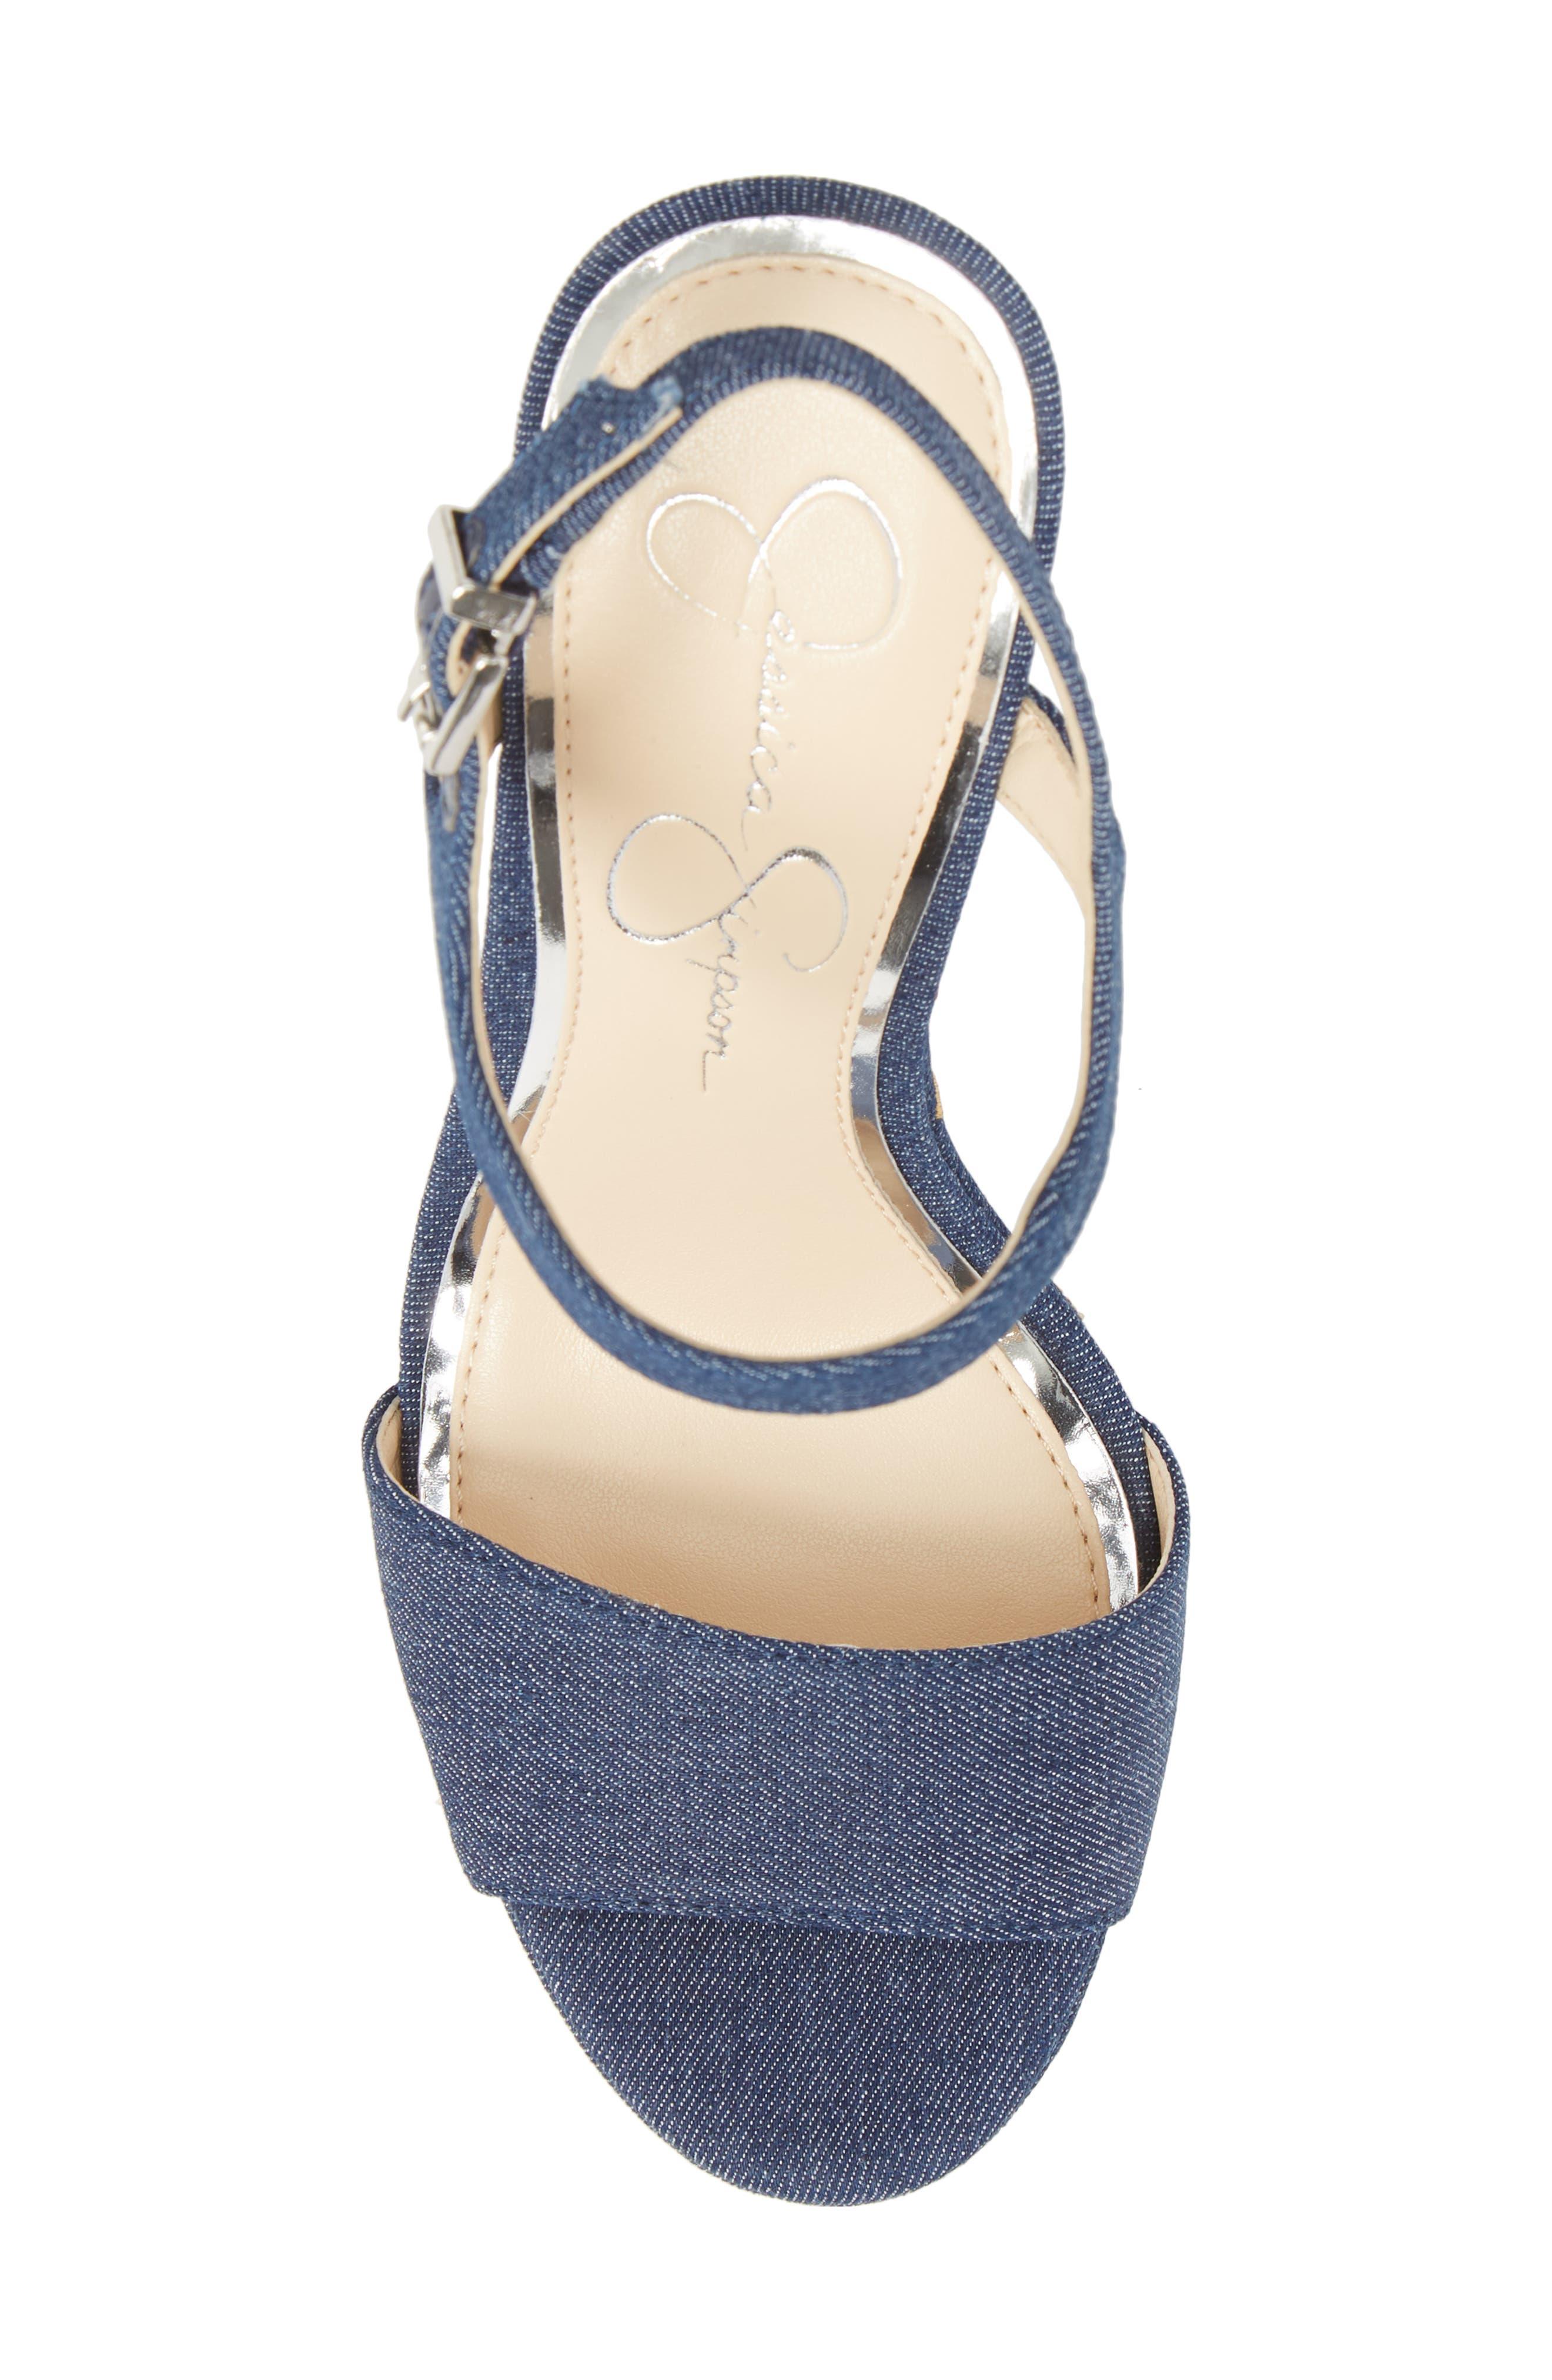 JESSICA SIMPSON,                             Divella Embroidered Platform Sandal,                             Alternate thumbnail 5, color,                             410